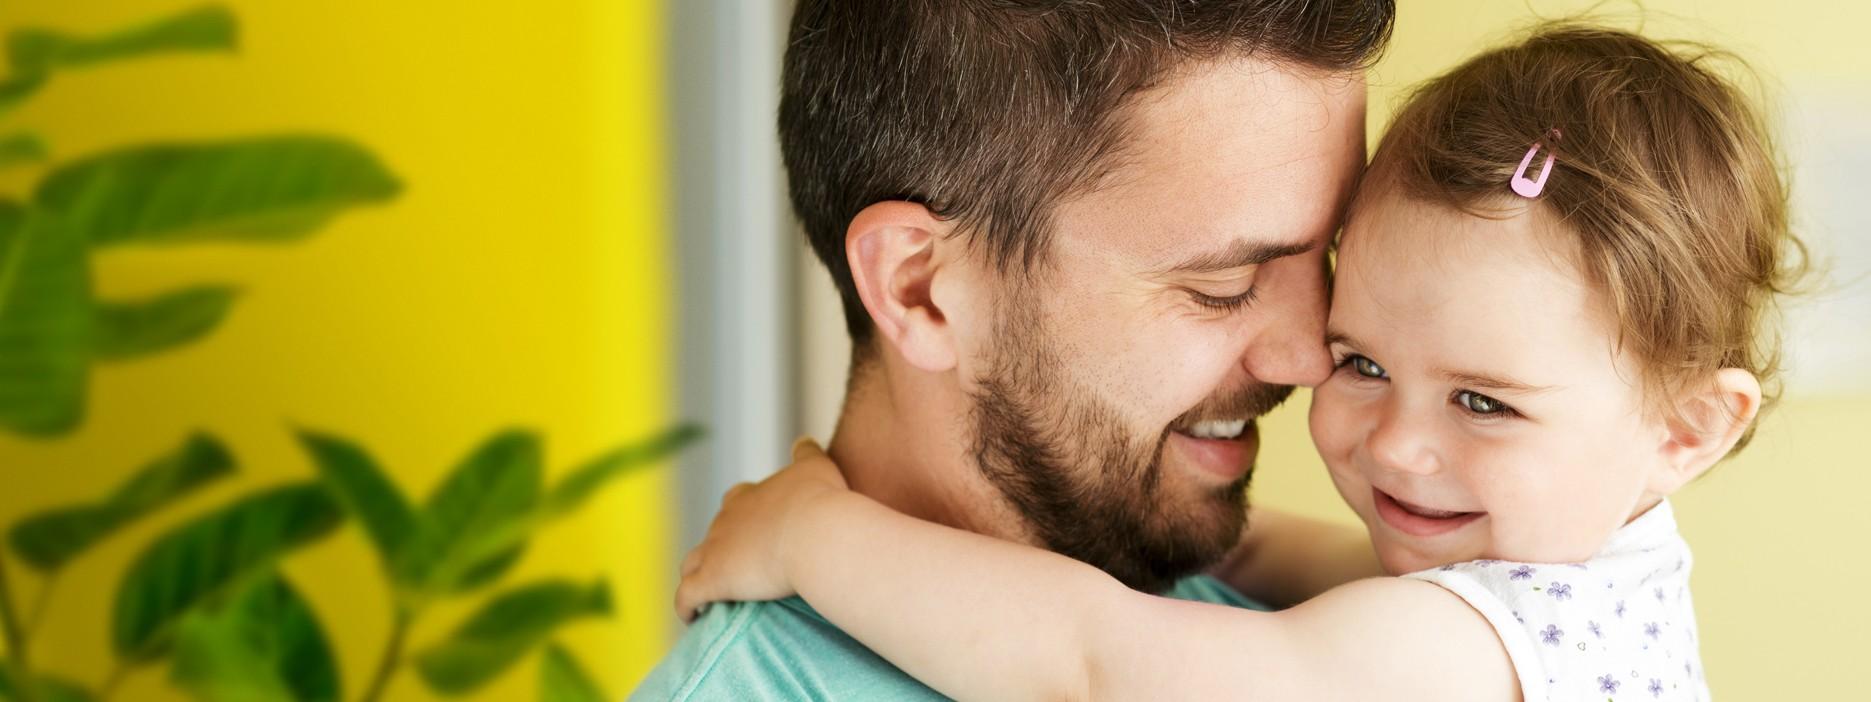 Vater hält sein Kind auf dem Arm